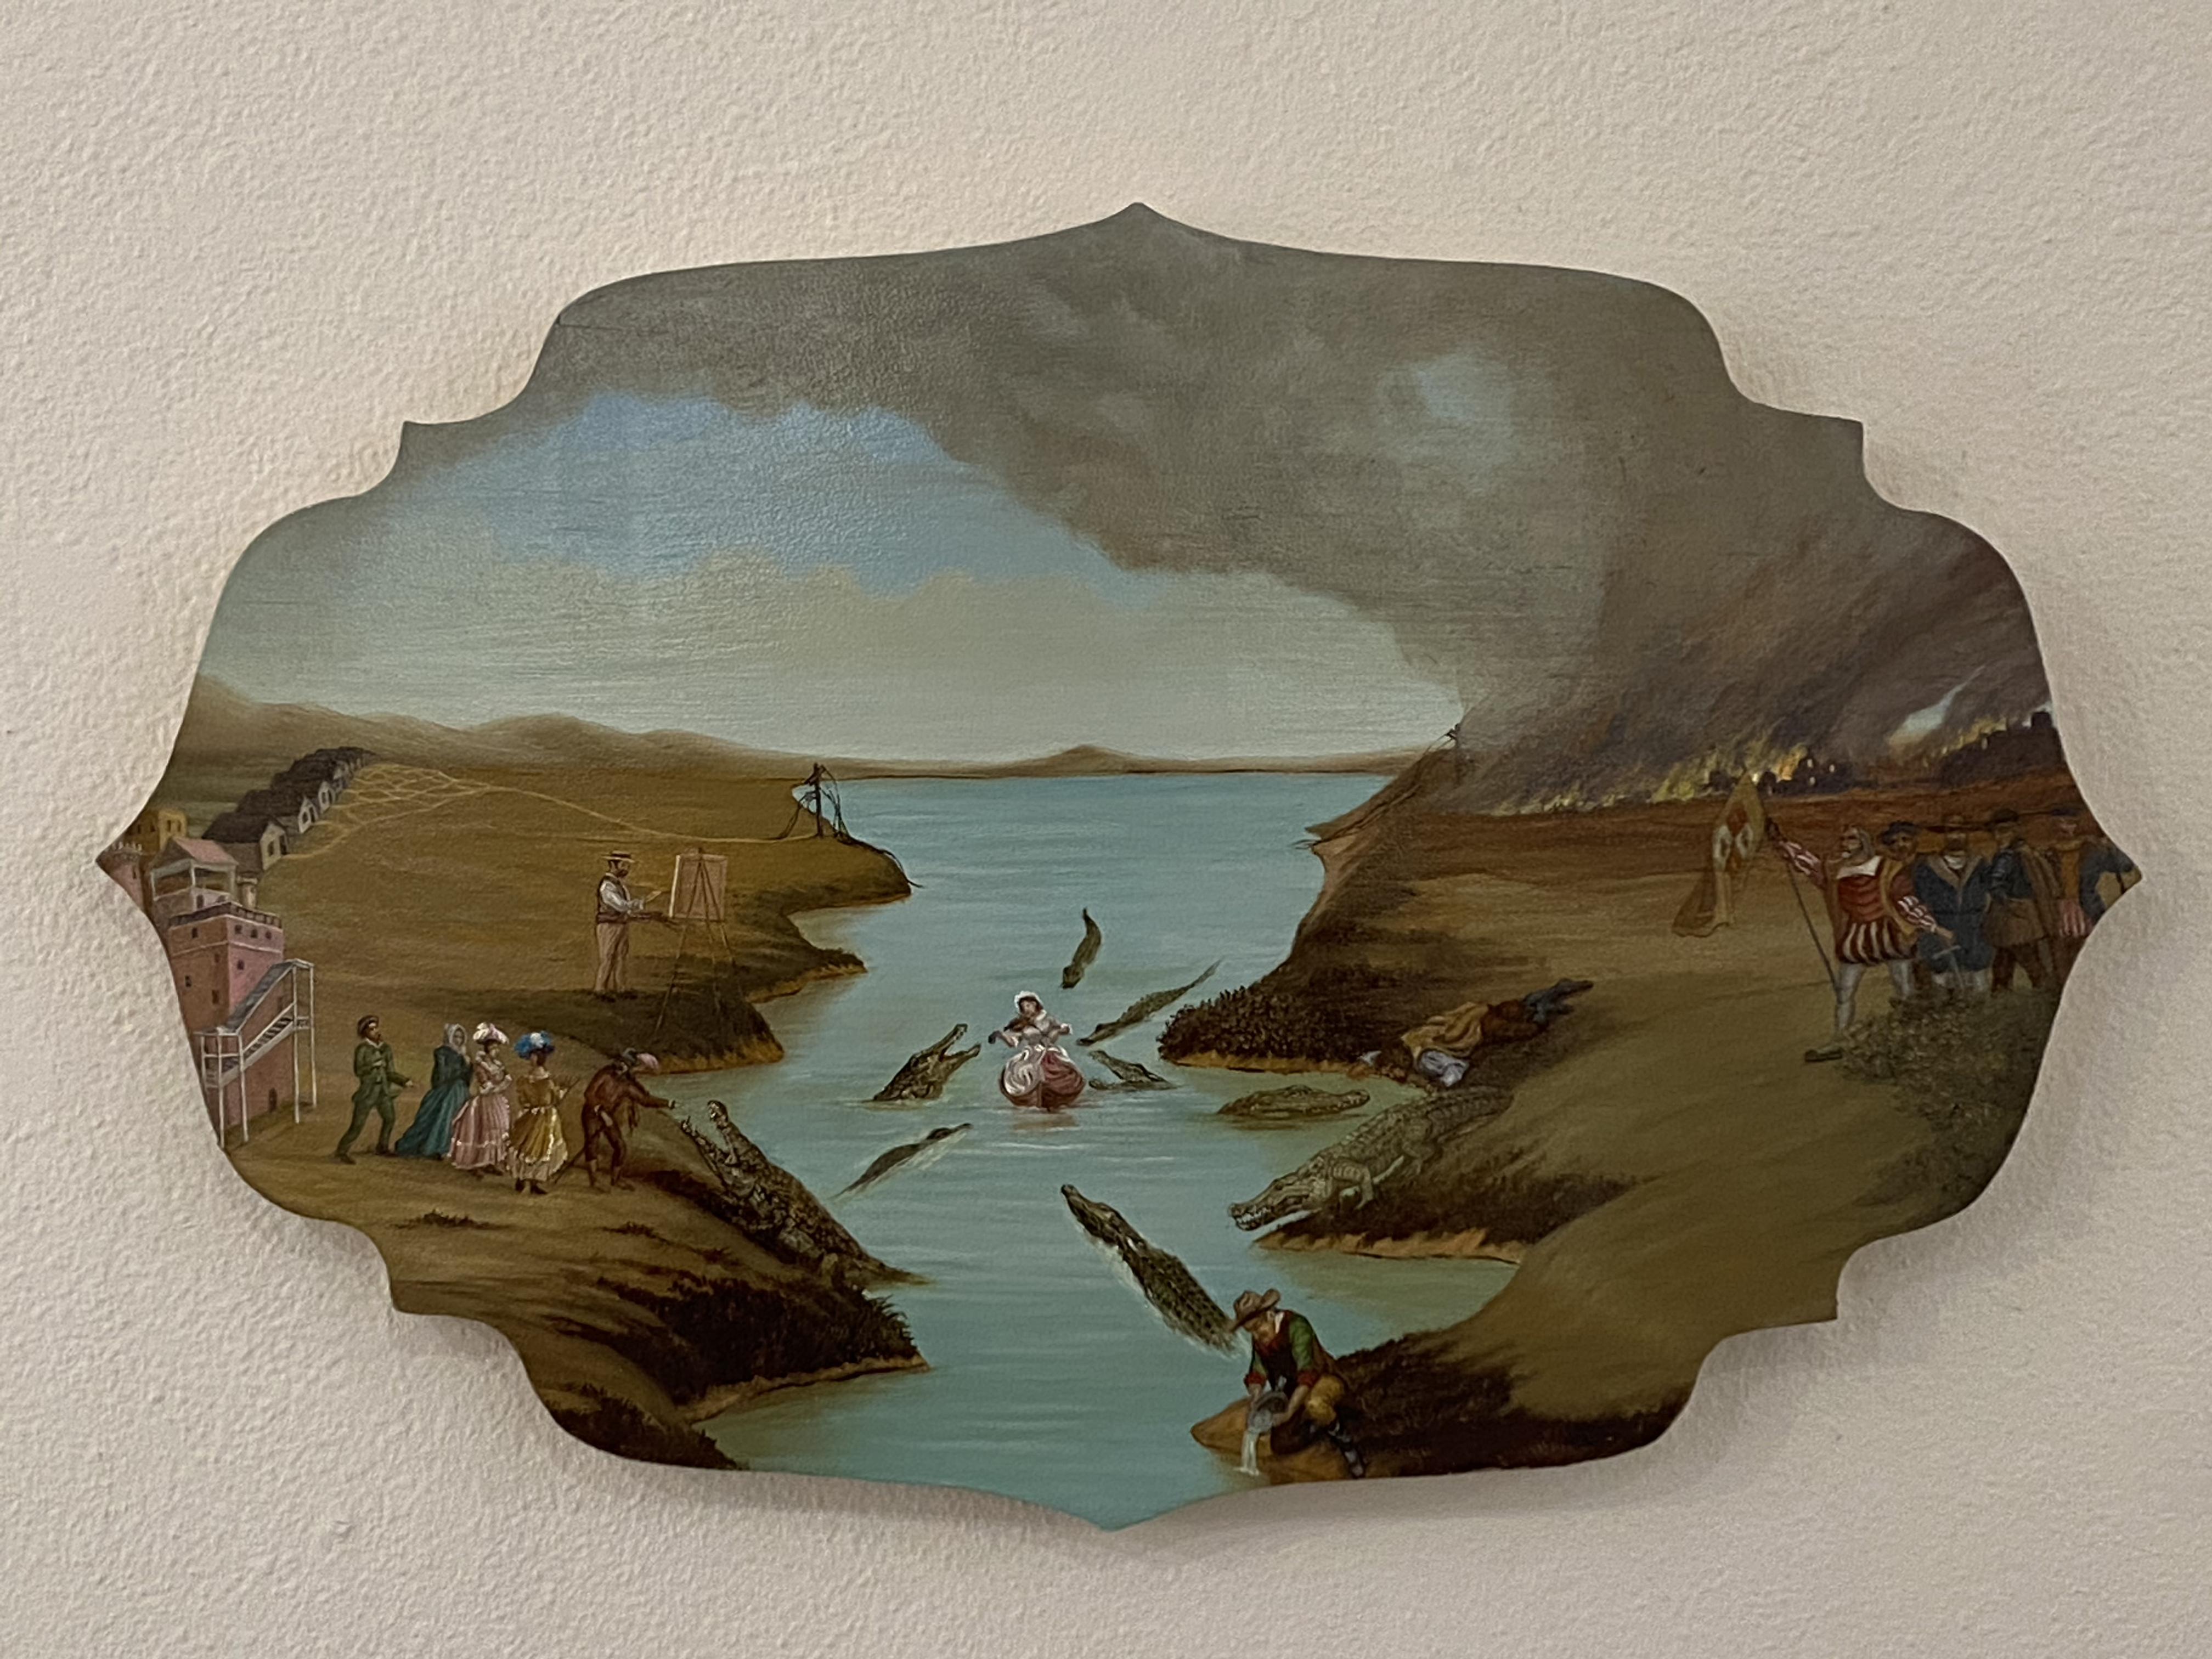 """Crocodile Tears"" 16x20 inches oil on wood"